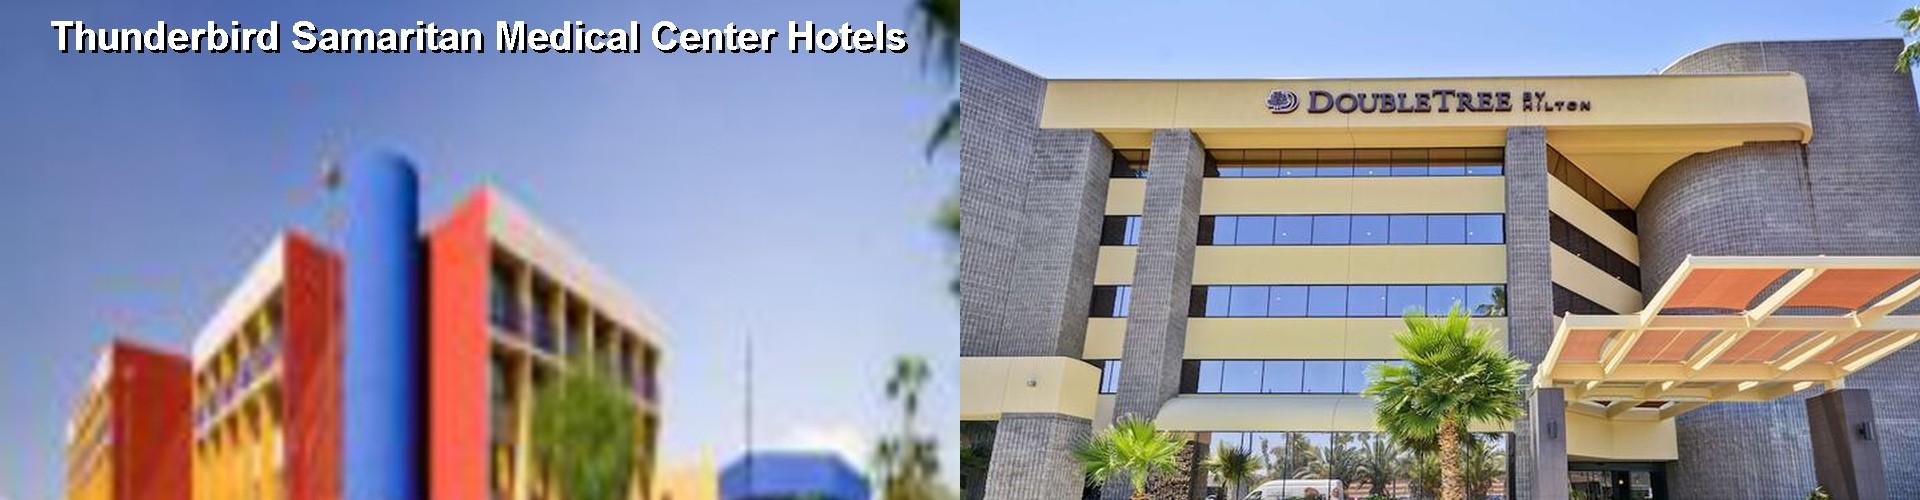 5 Best Hotels Near Thunderbird Samaritan Medical Center